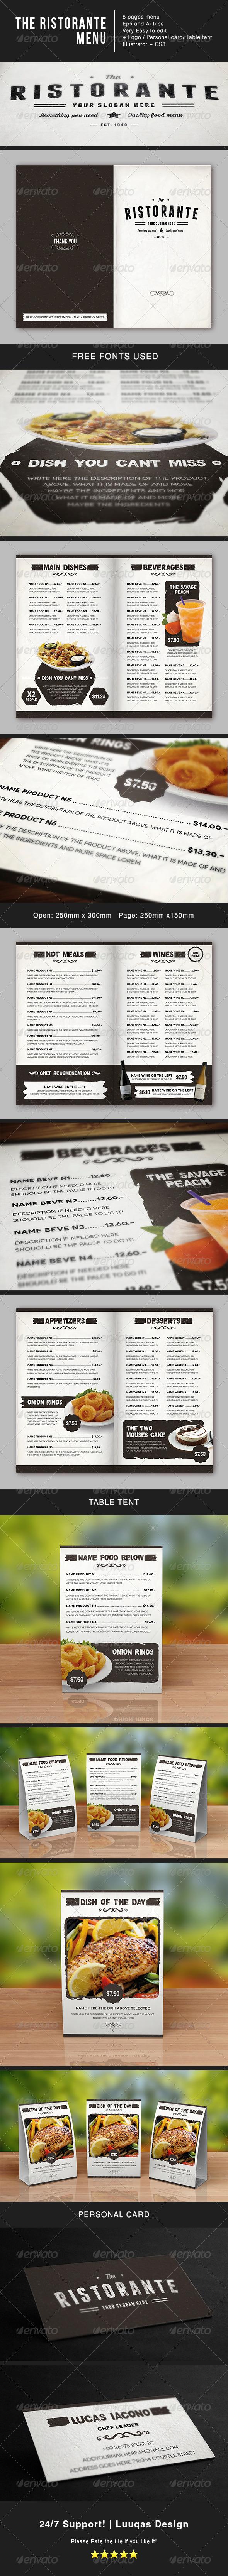 The Ristorante Food Menu - Food Menus Print Templates